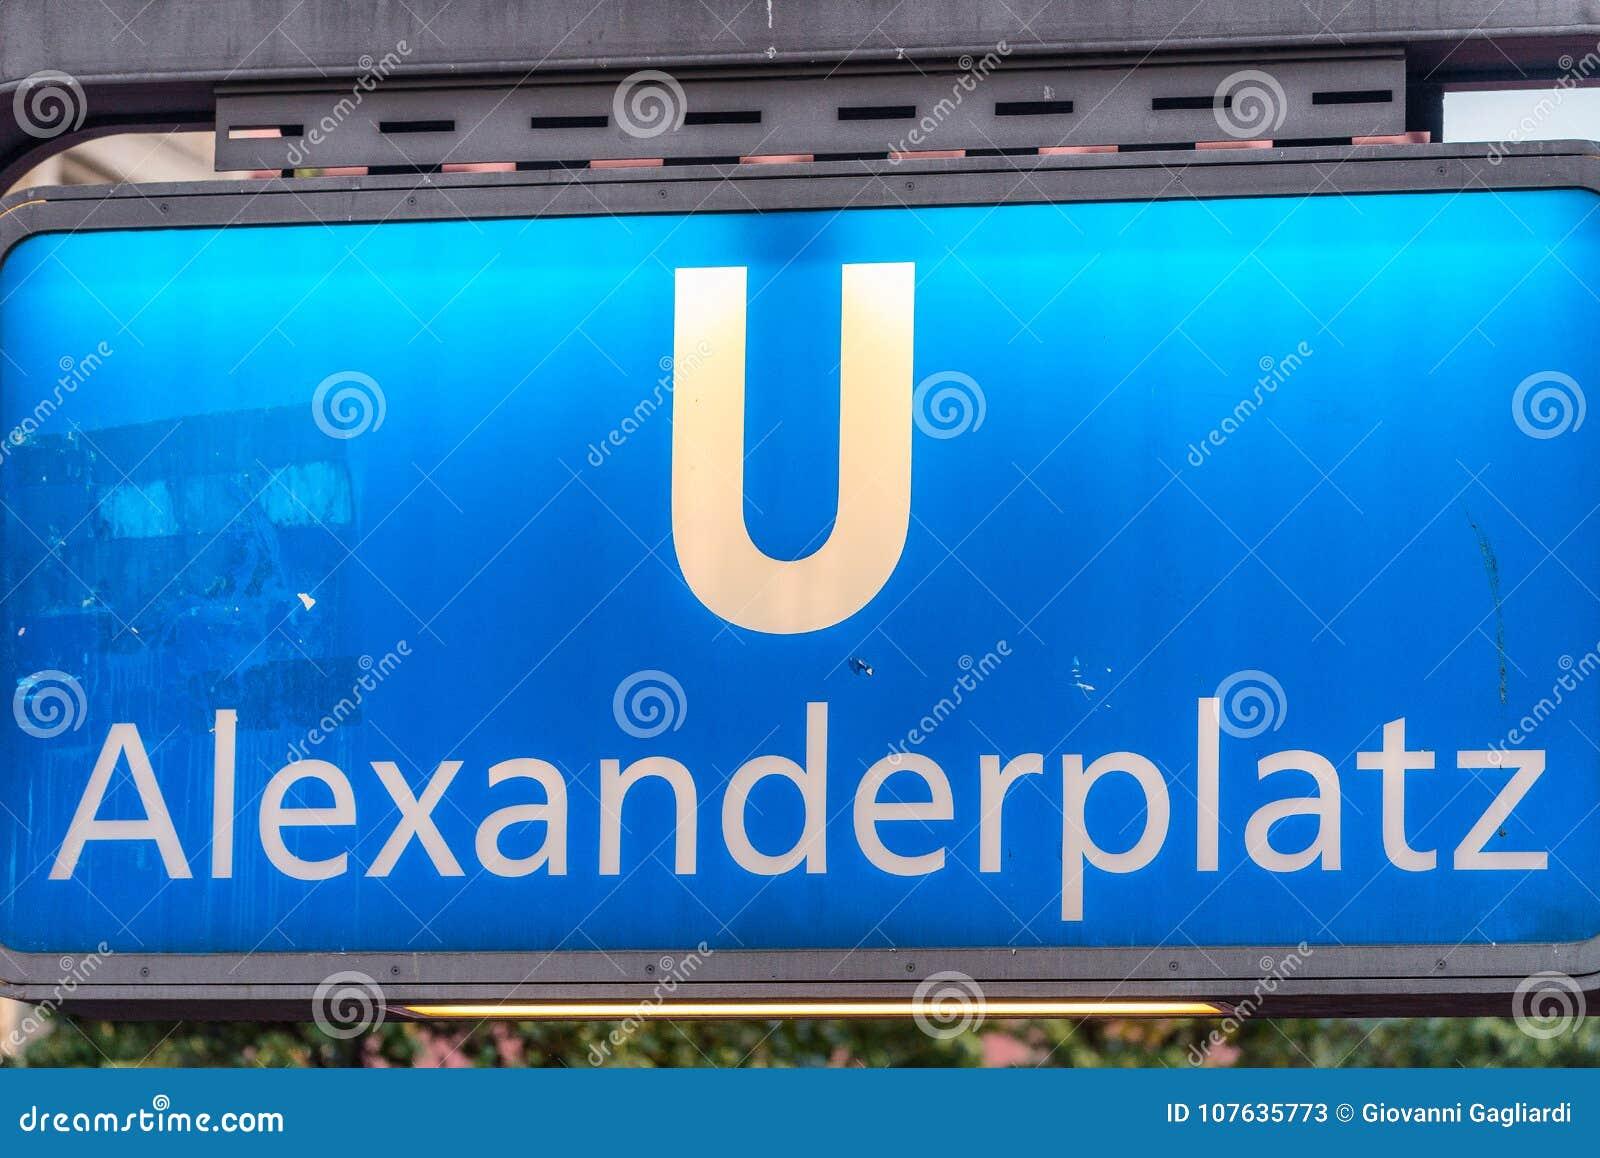 BERLÍN, ALEMANIA - 23 DE JULIO DE 2016: Metro S-Bahn de Alexanderplatz